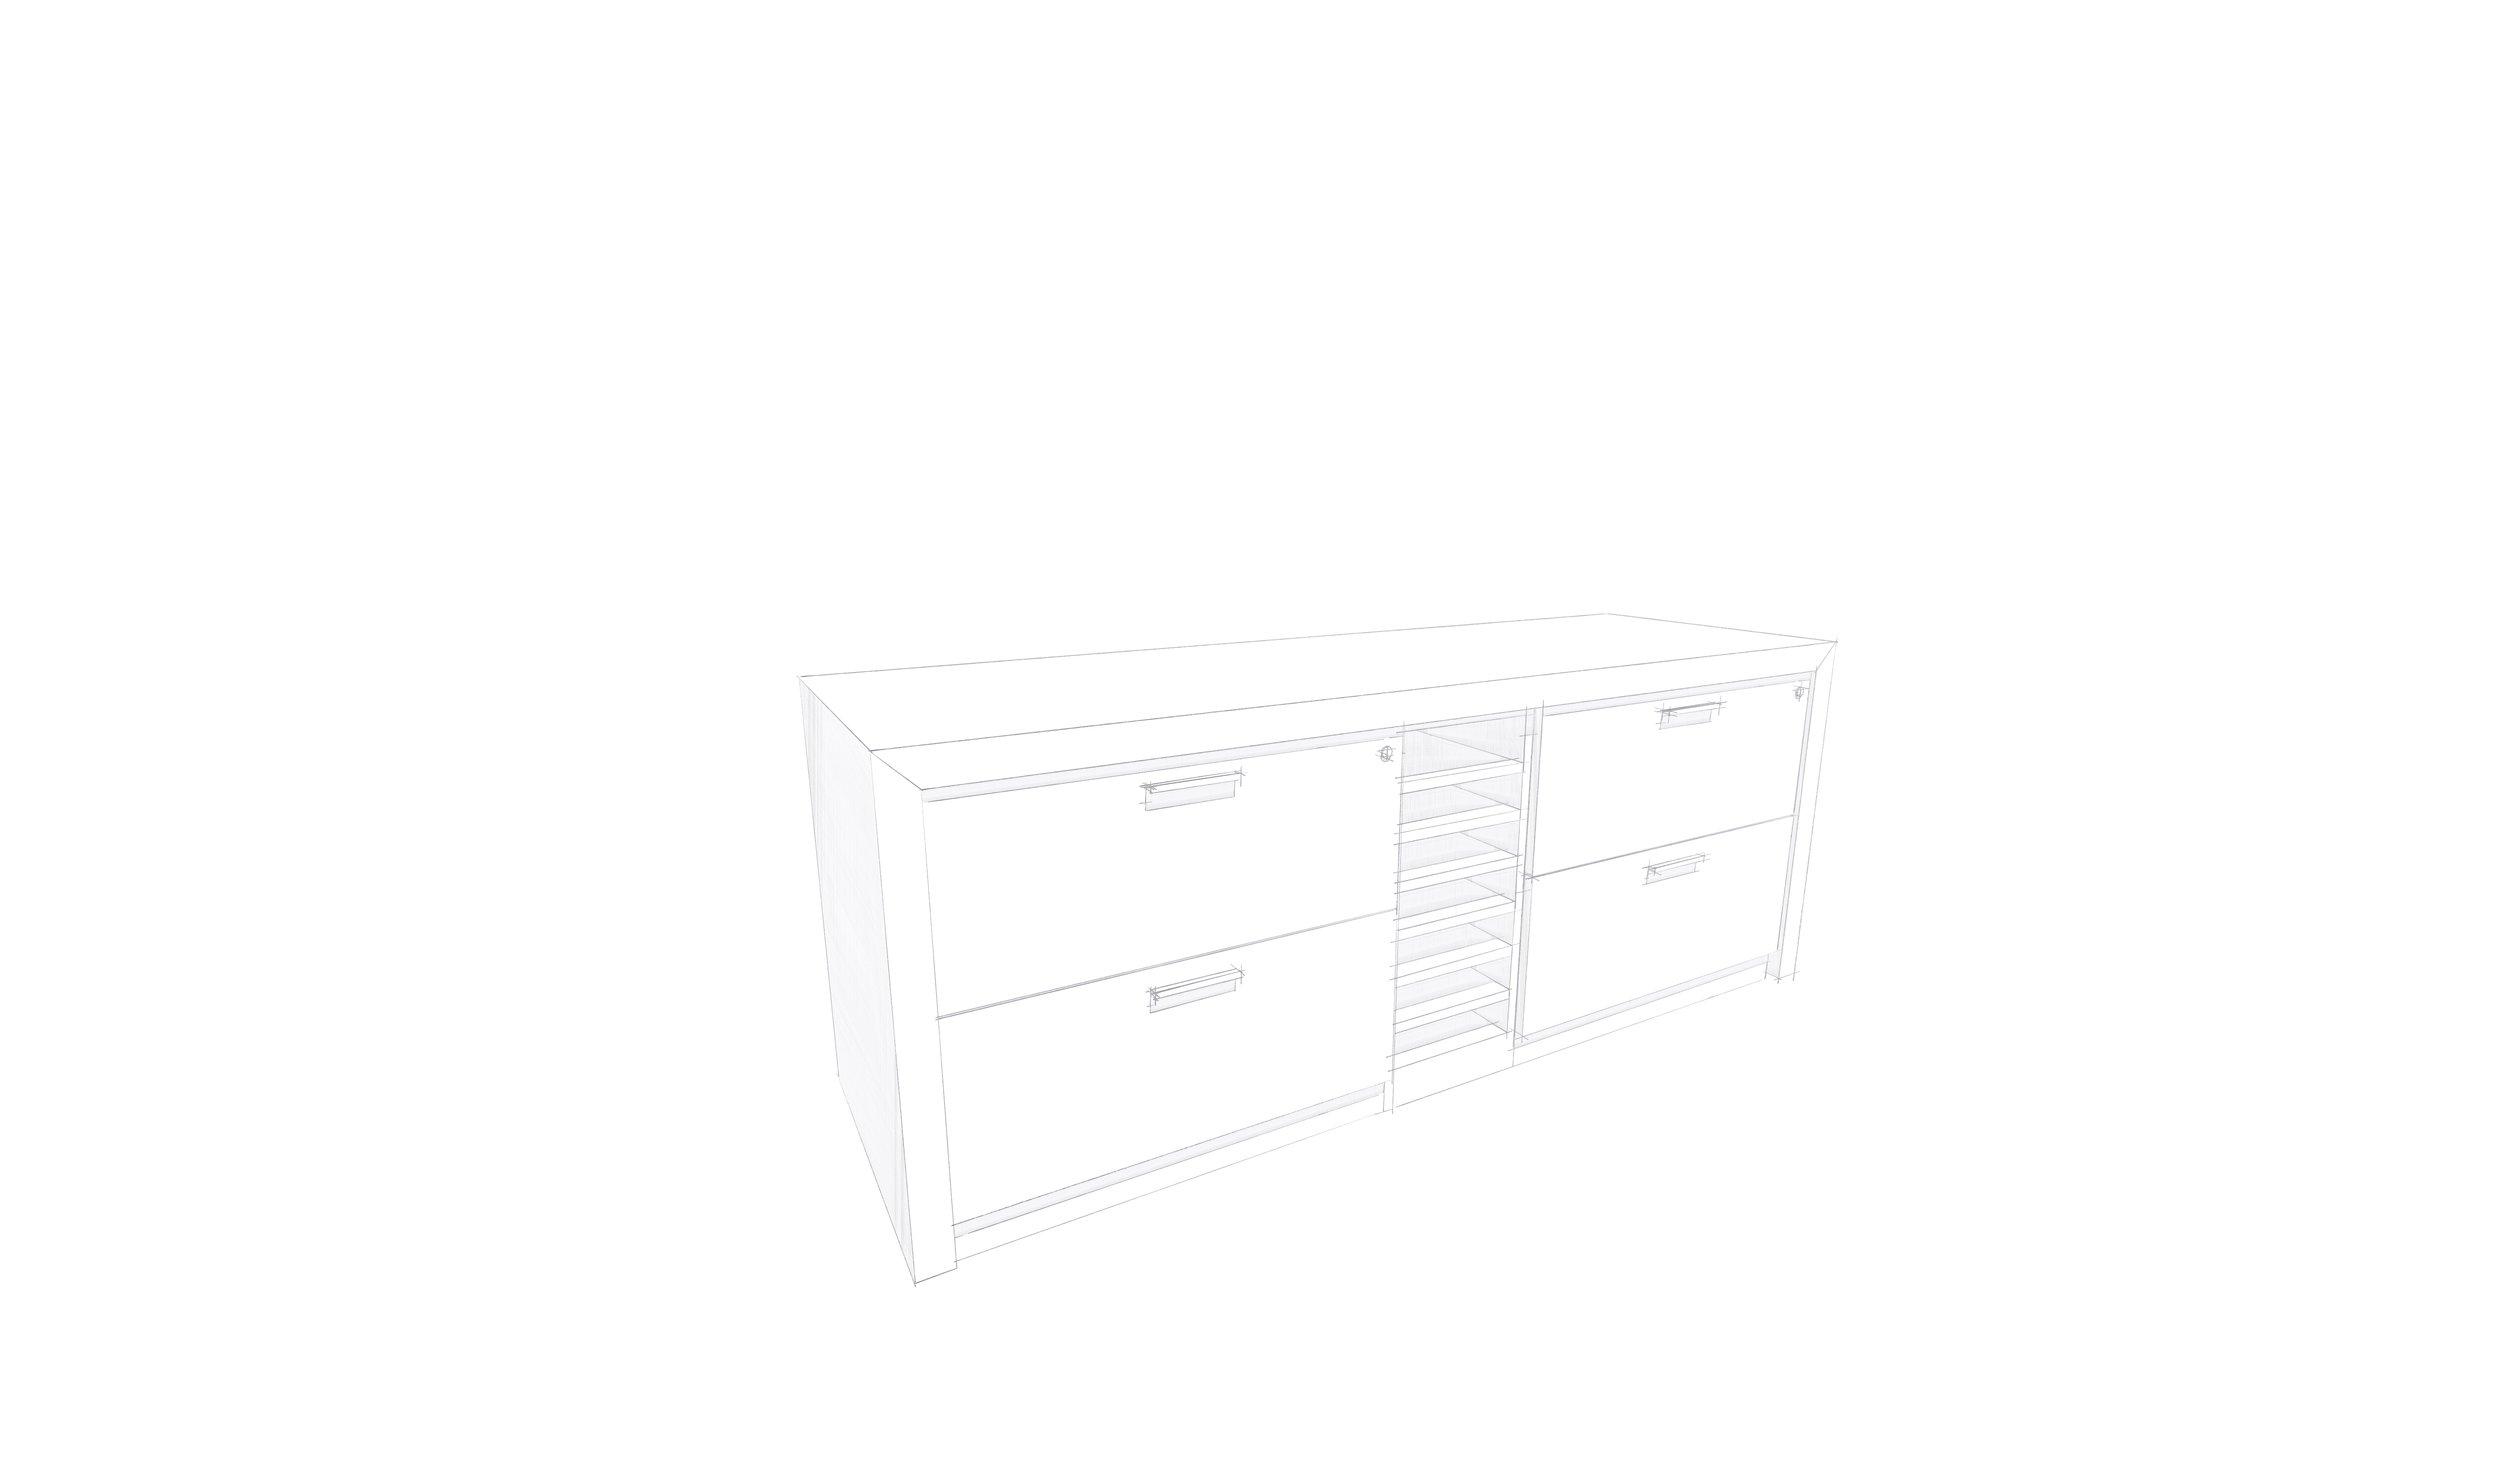 Typical 5 - Credenza w: Storage (B).jpg